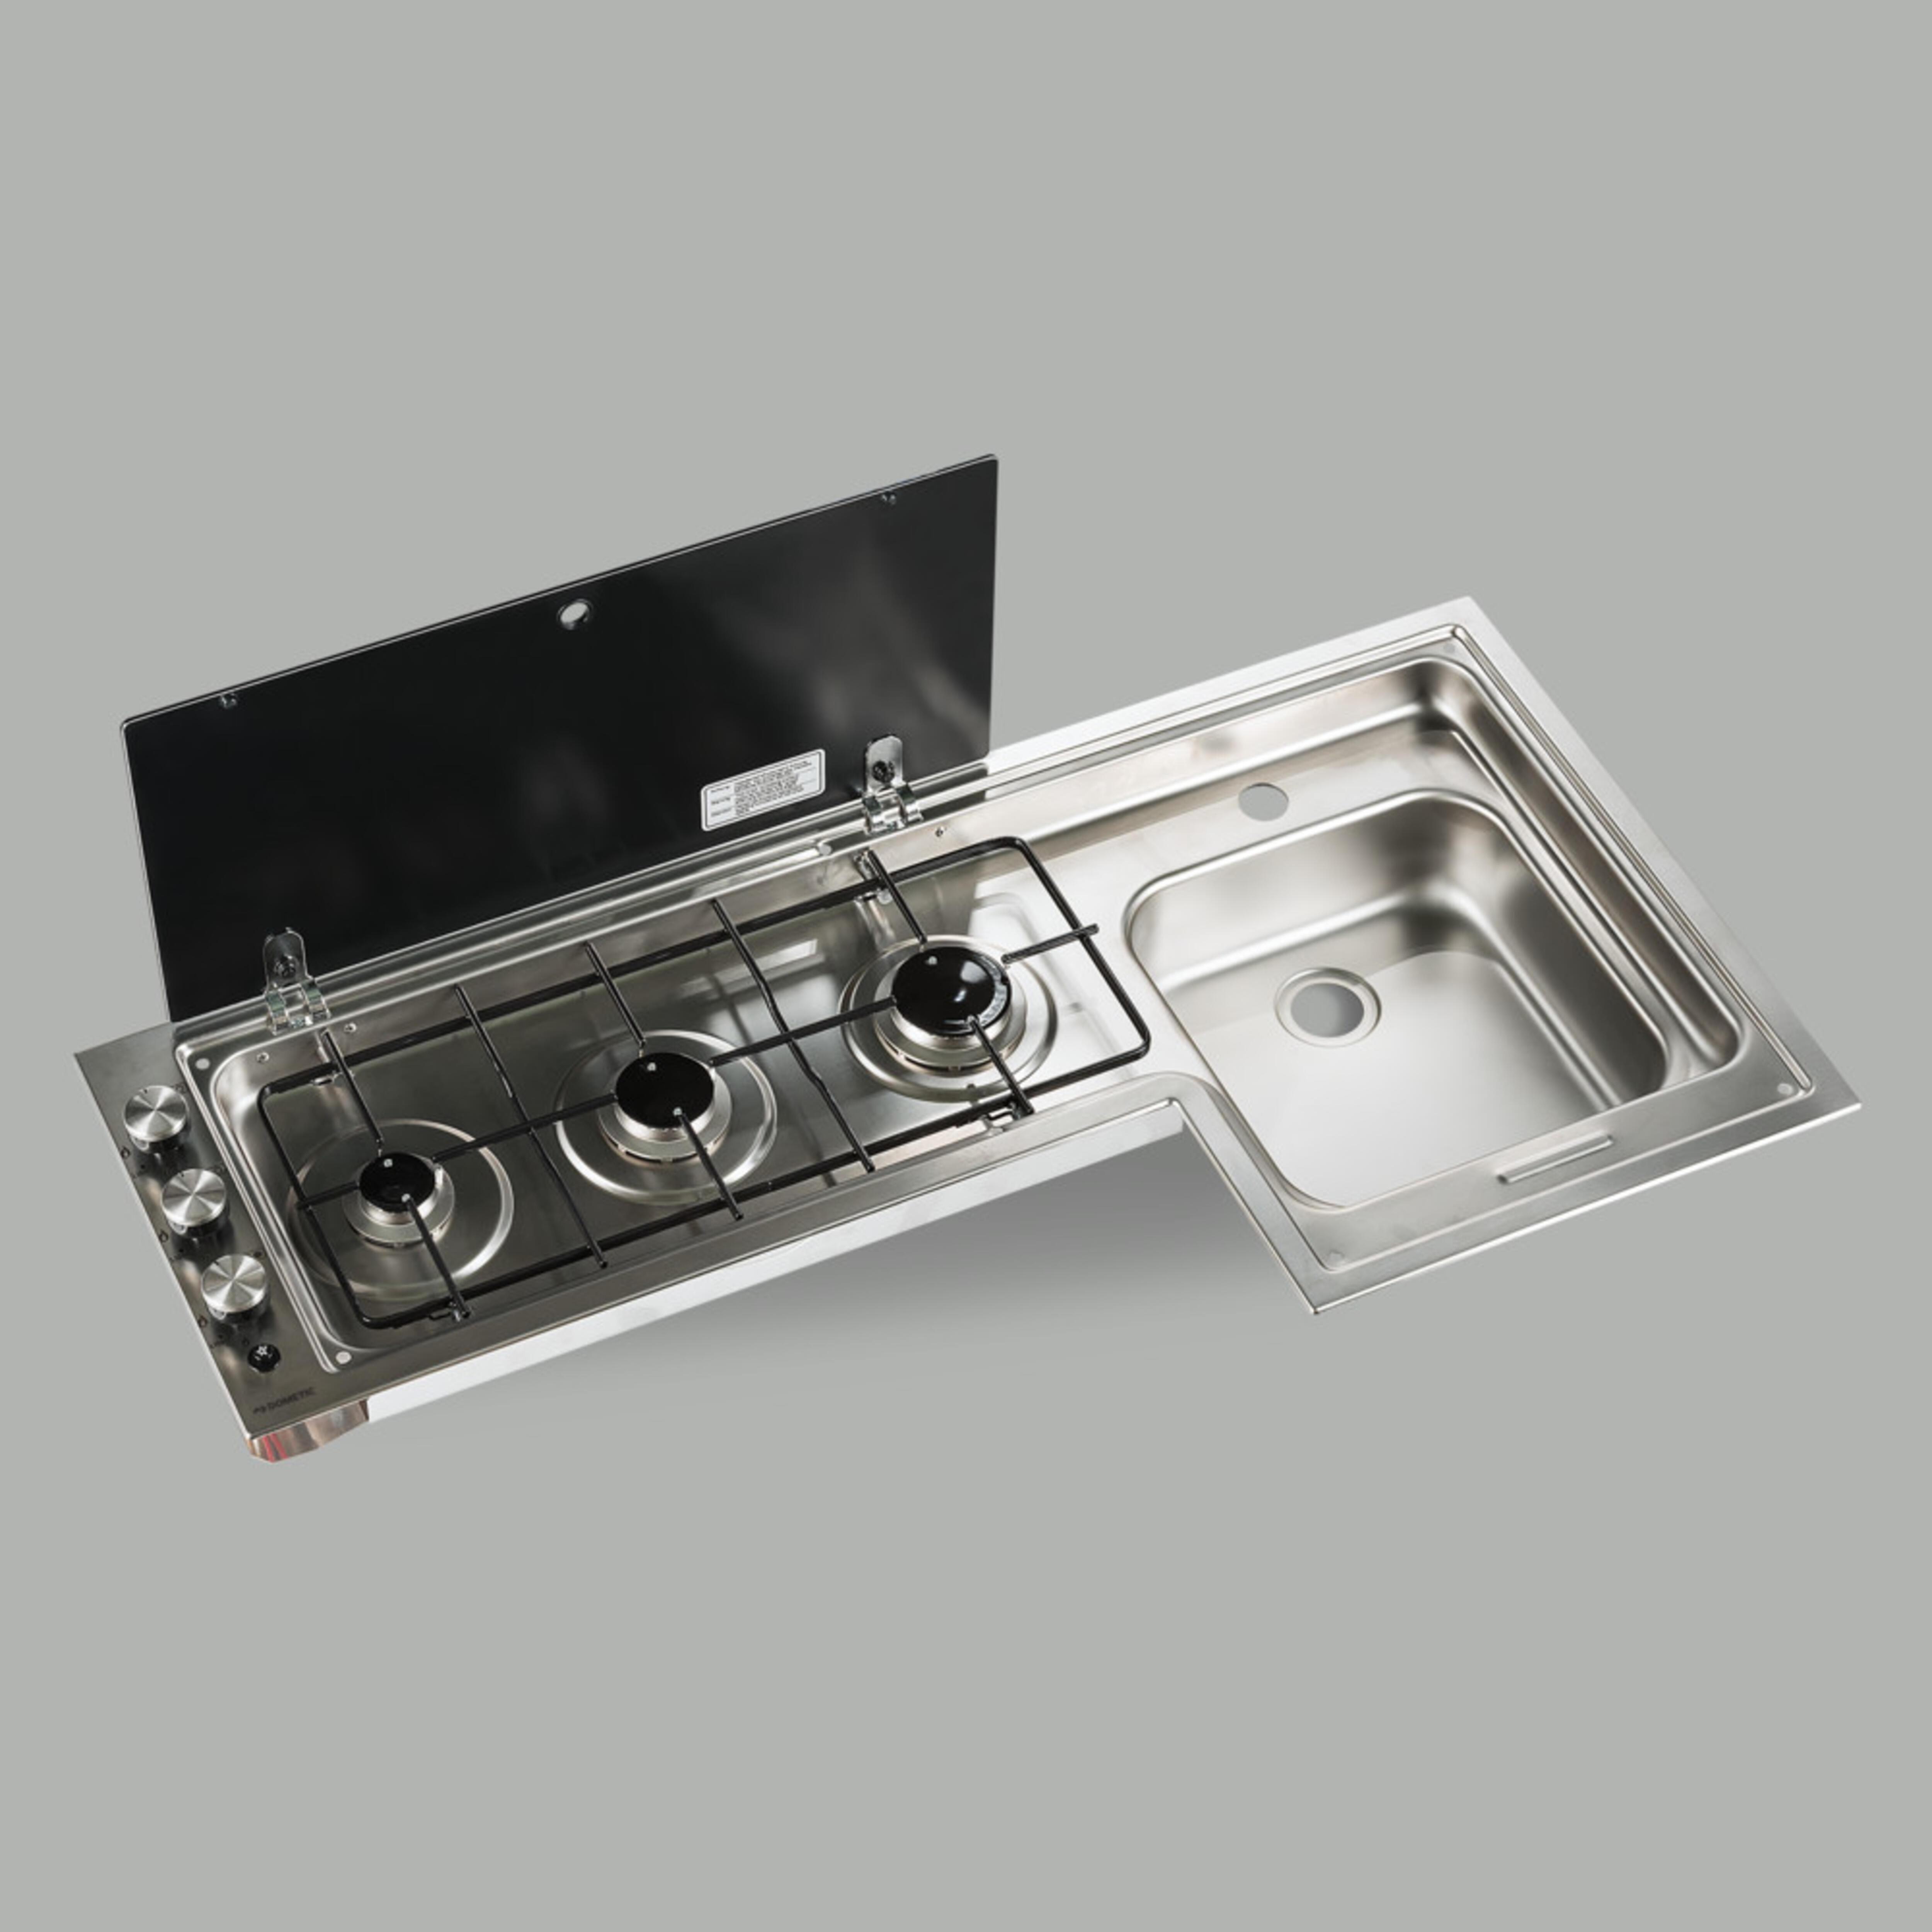 Dometic Range/Sink Combination